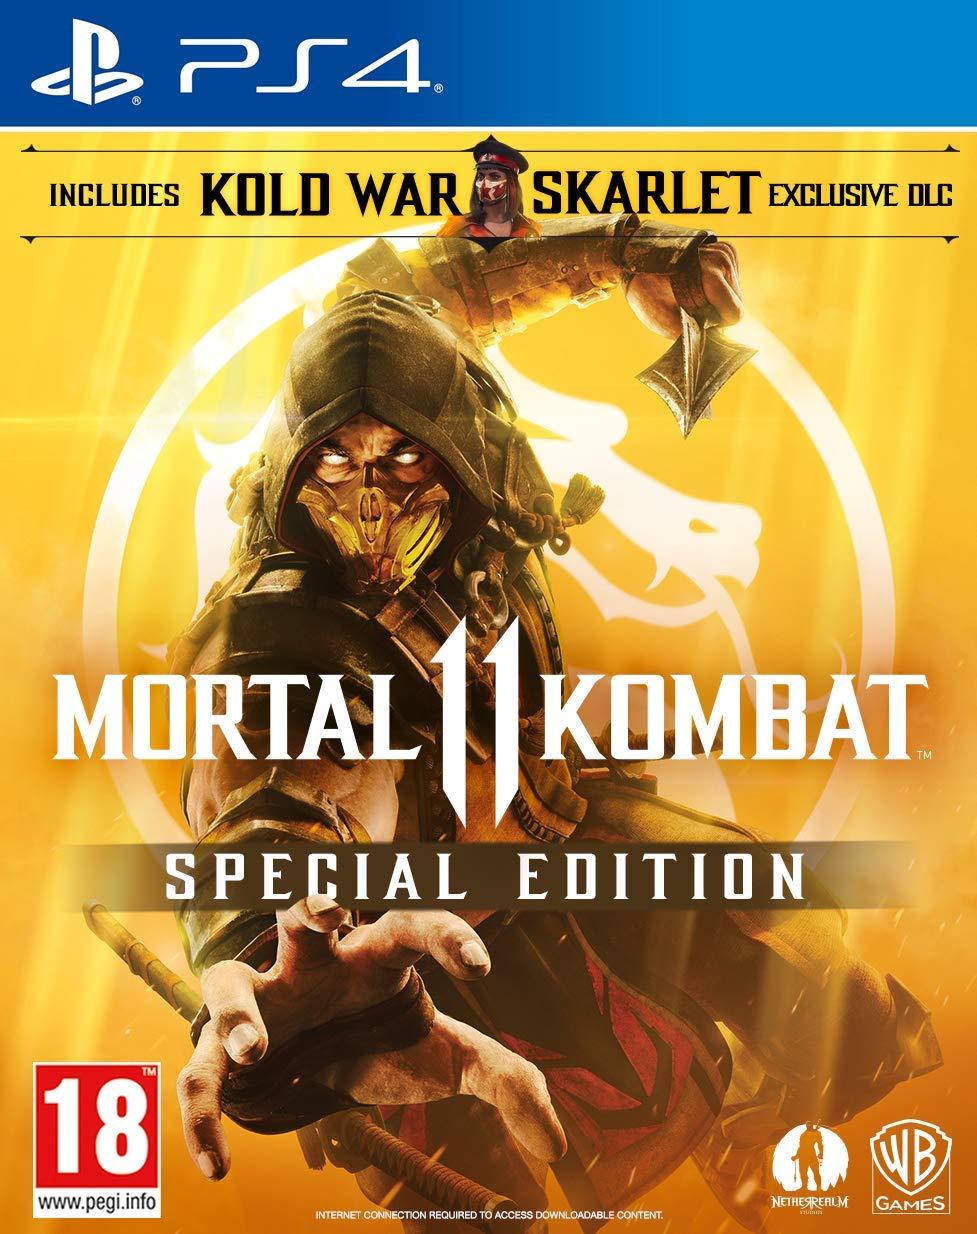 Mortal Kombat 11 Special Edition PS4 / Xbox One £29.99 - Amazon Exclusive